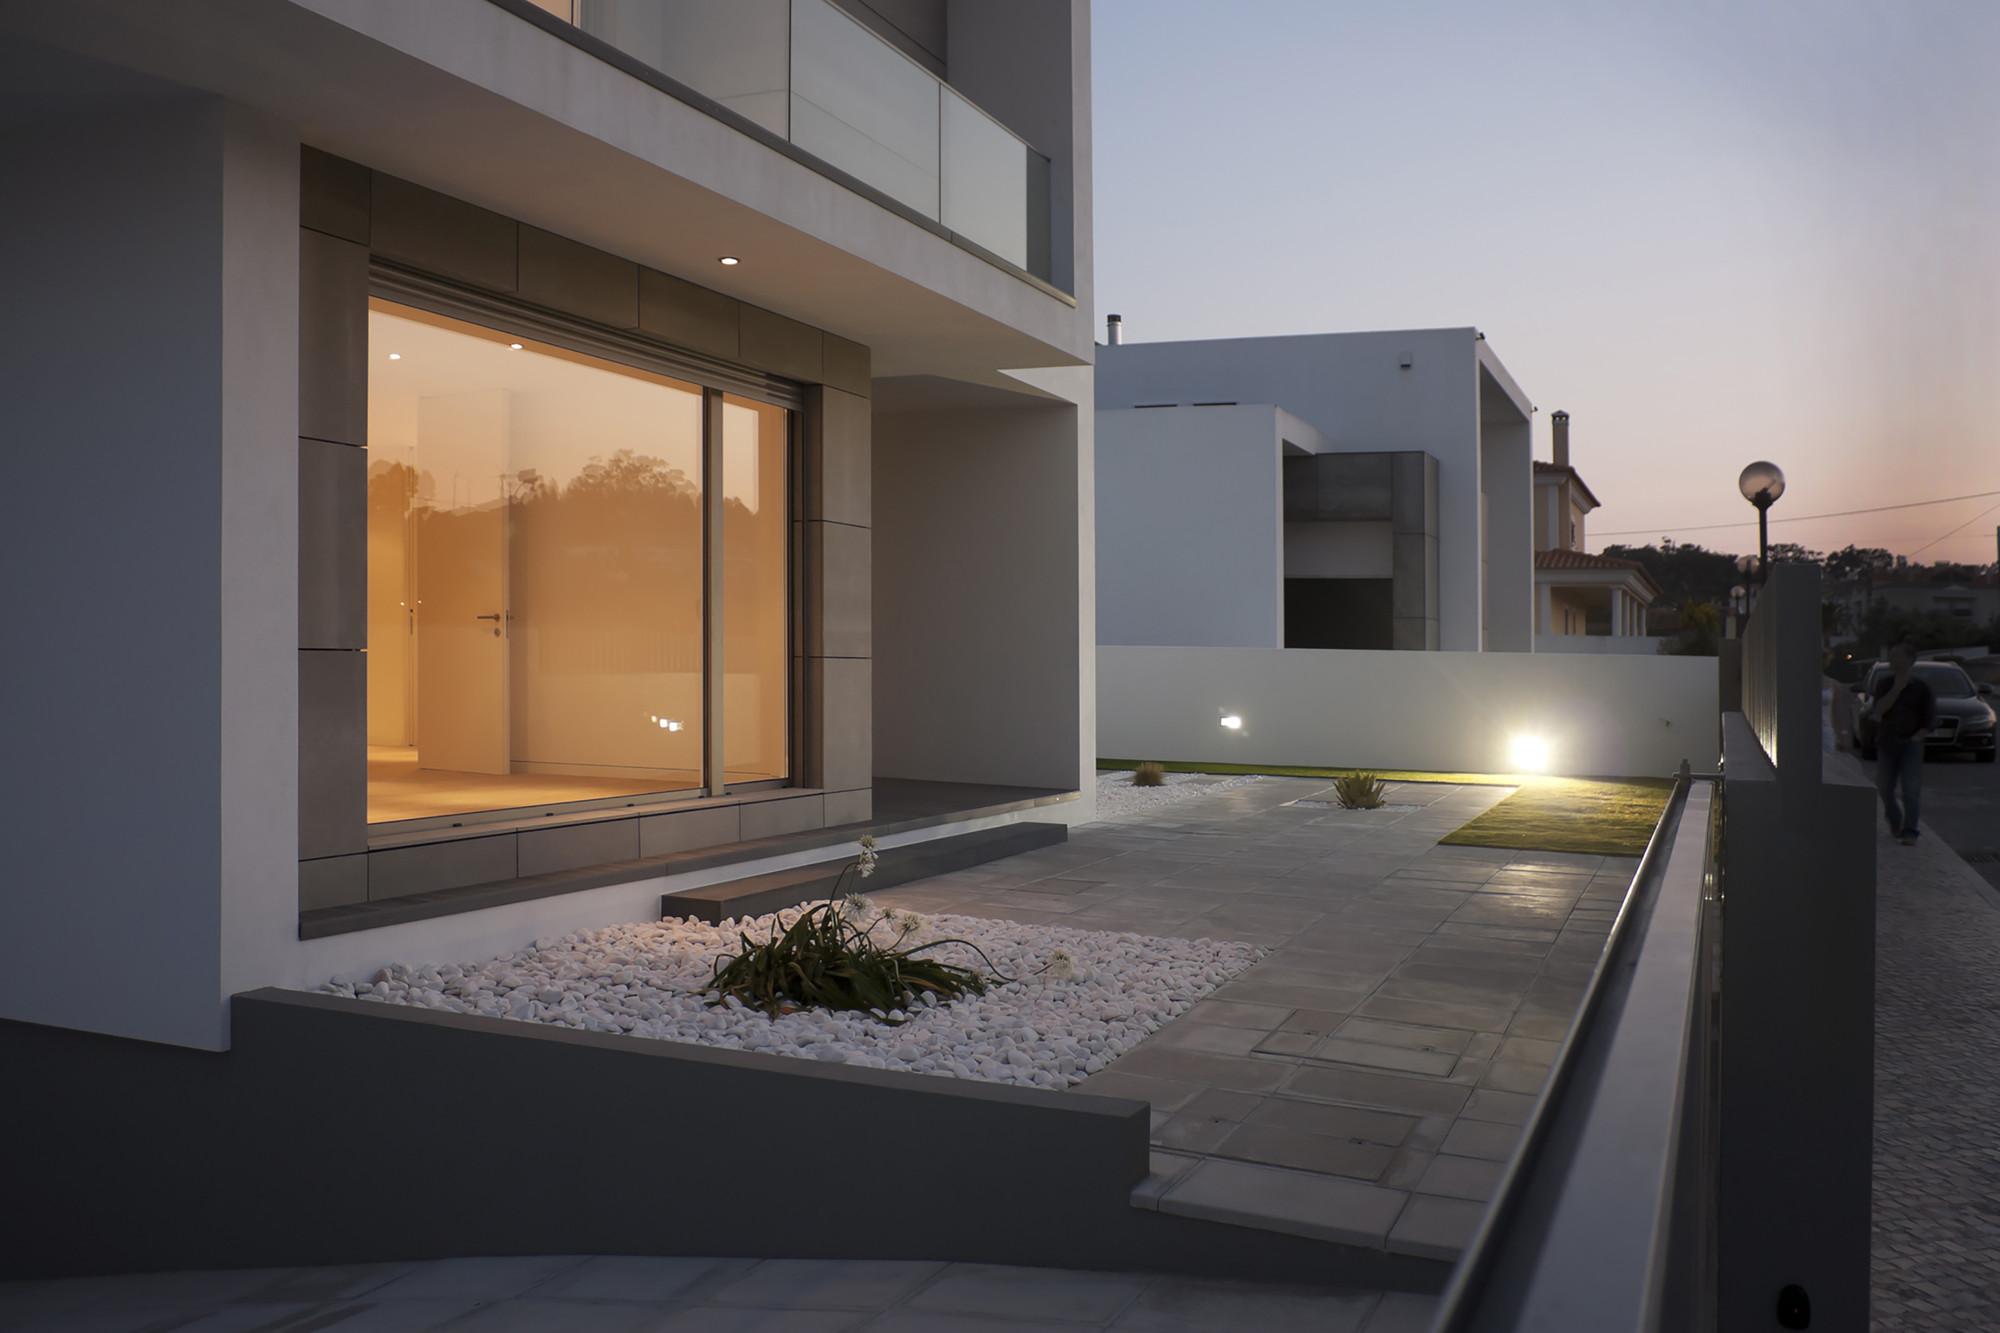 Galeria de casa paulo rolo inspazo arquitectura 3 for Casa moderna 44 belvedere